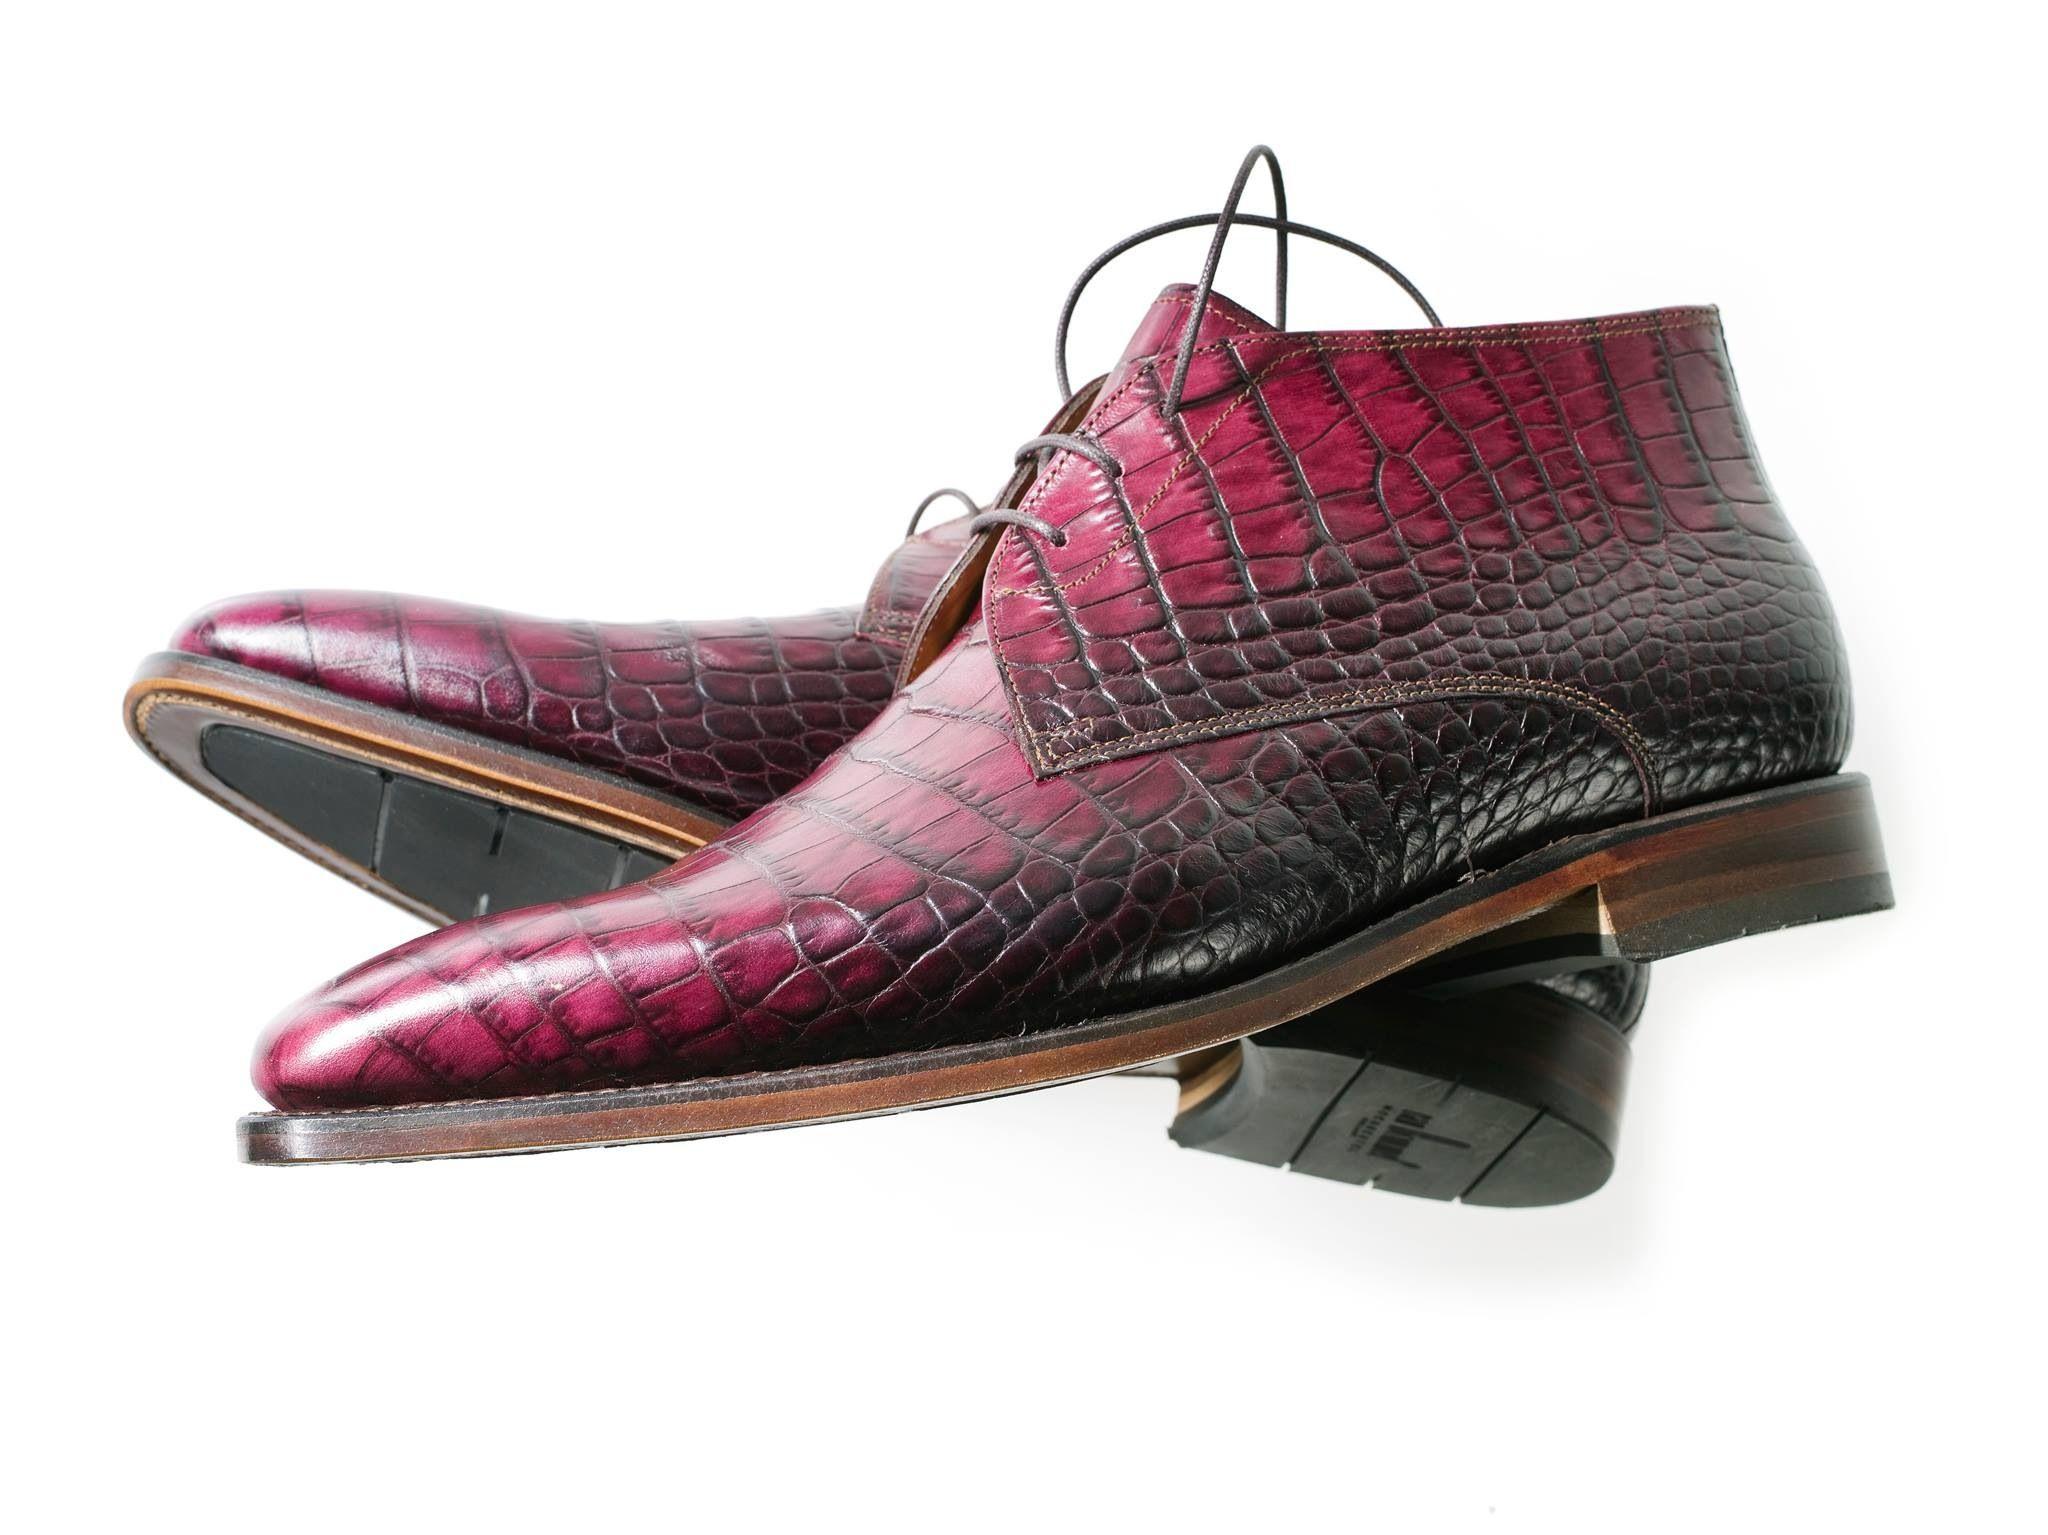 Chaussures Floris Van Bommel En Daim / Serpent Bleu l5SCr9qk